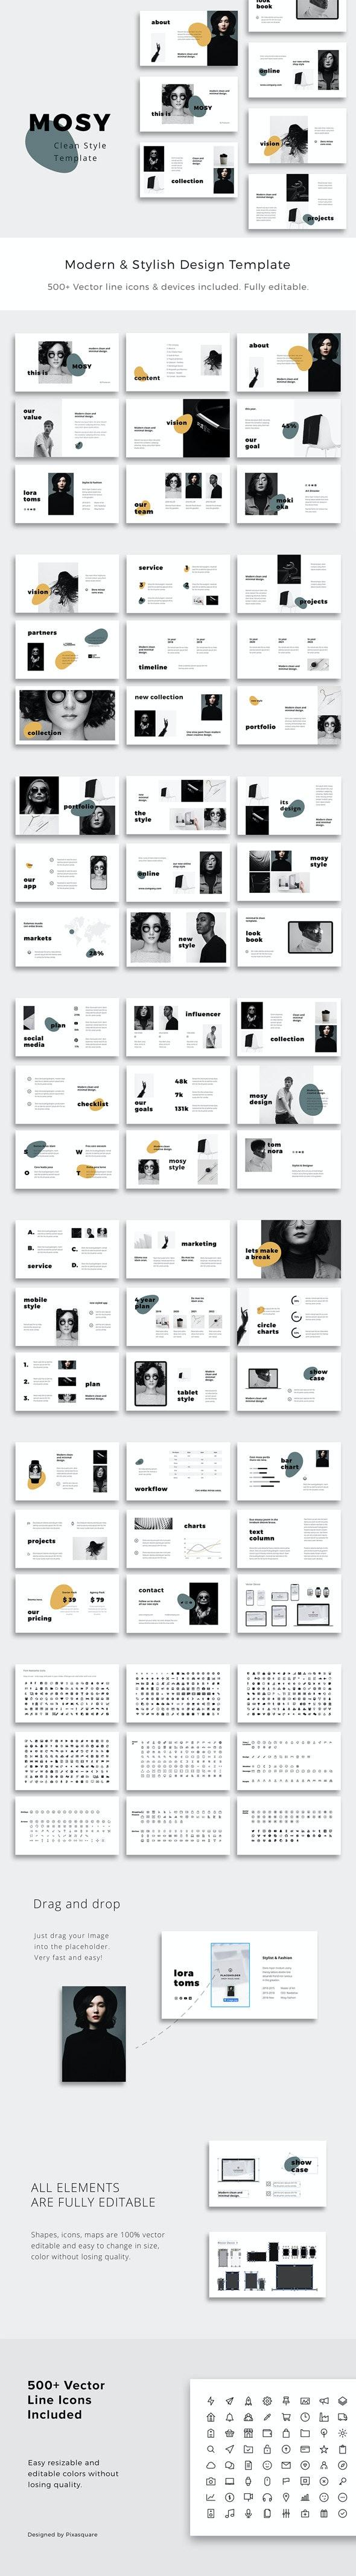 MOSY - Keynote Clean and Stylish Presentation Template - Creative Keynote Templates